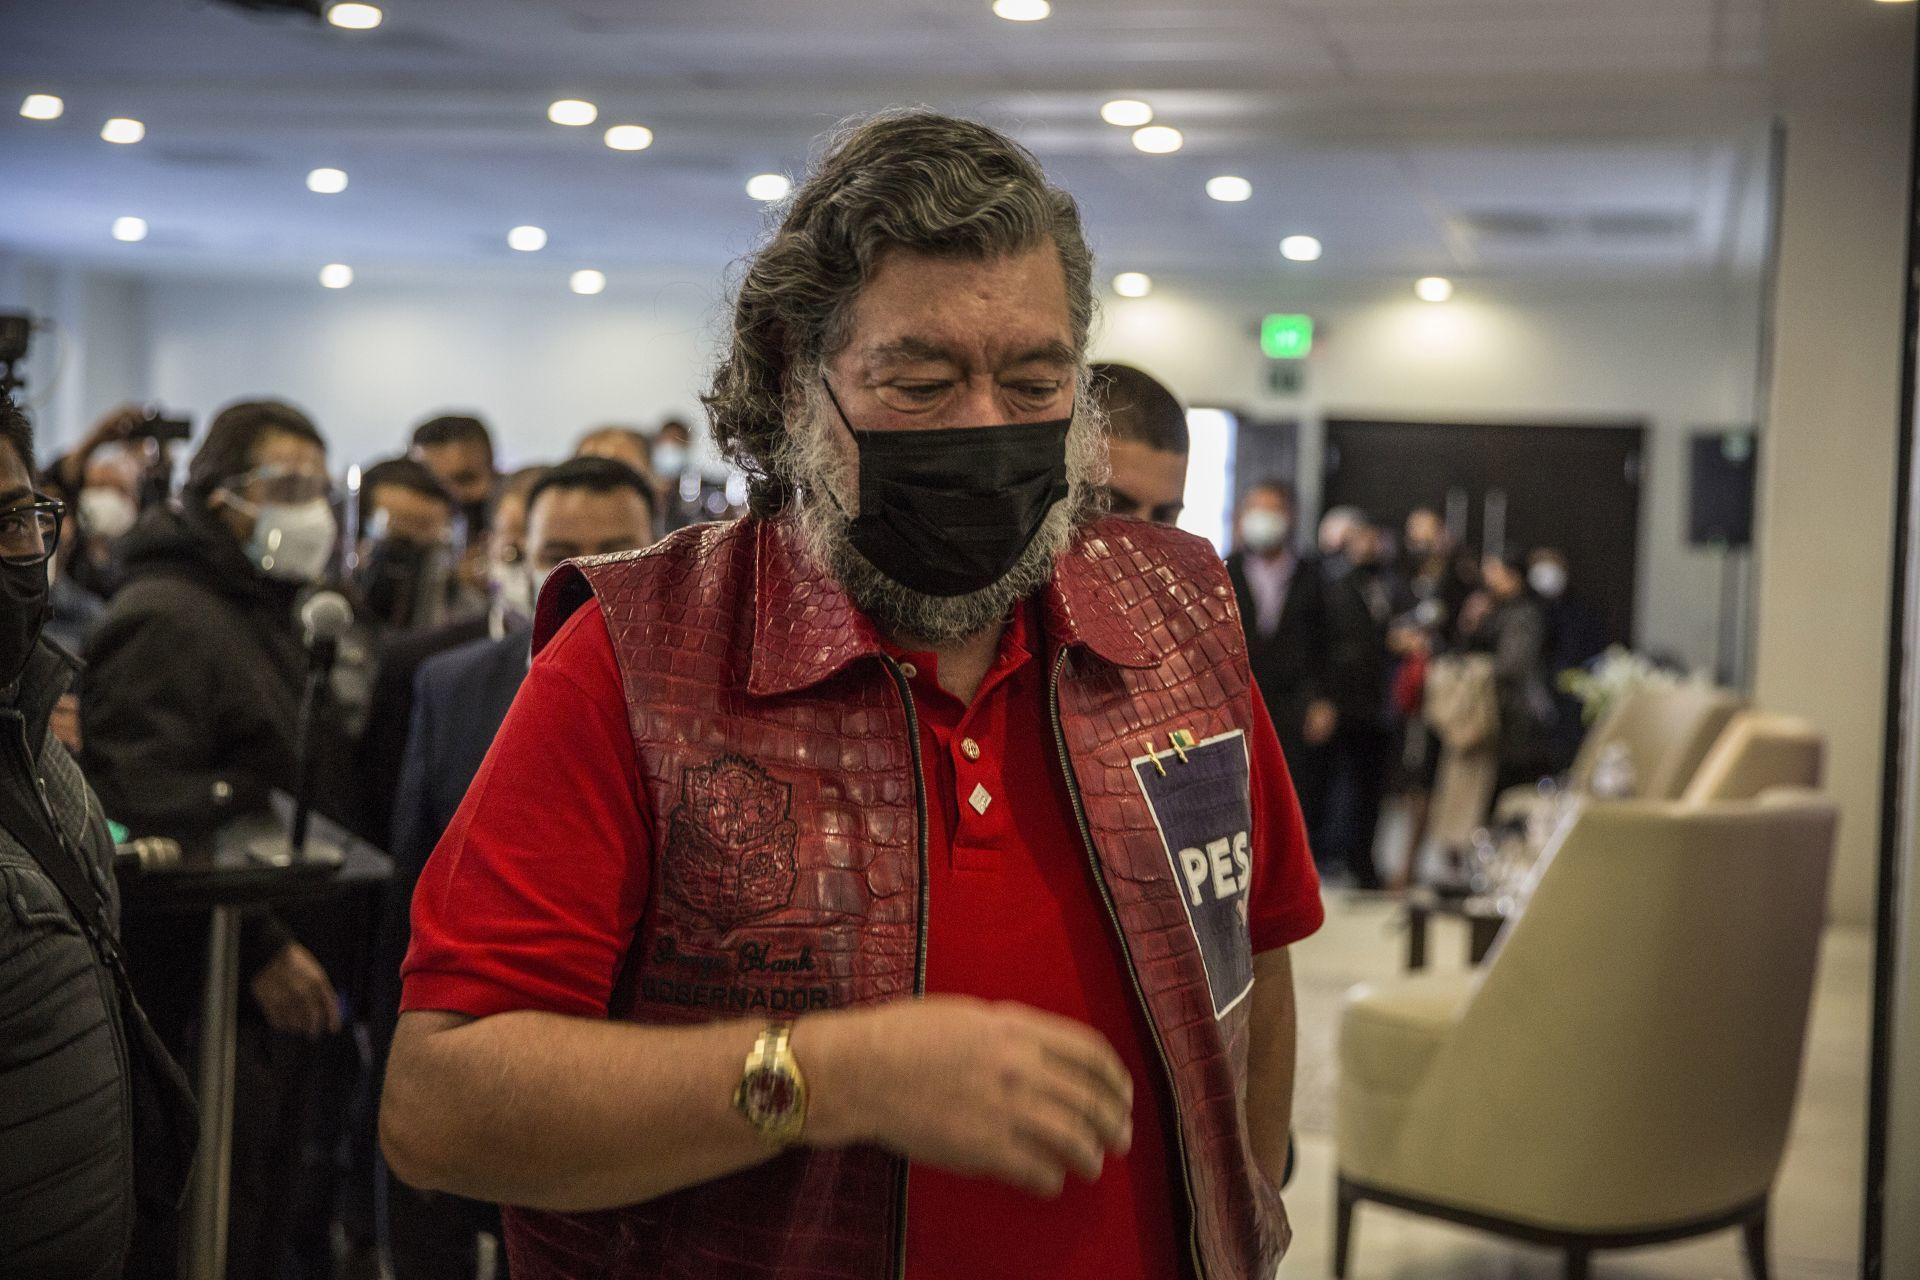 TIJUANA, BAJA CALIFORNIA, 26ENERO2021.- Jorge Hank Rhon se registró esta tarde se postuló como canditado a la gobernatura de Baja California por el Partido Encuentro Social (PES).